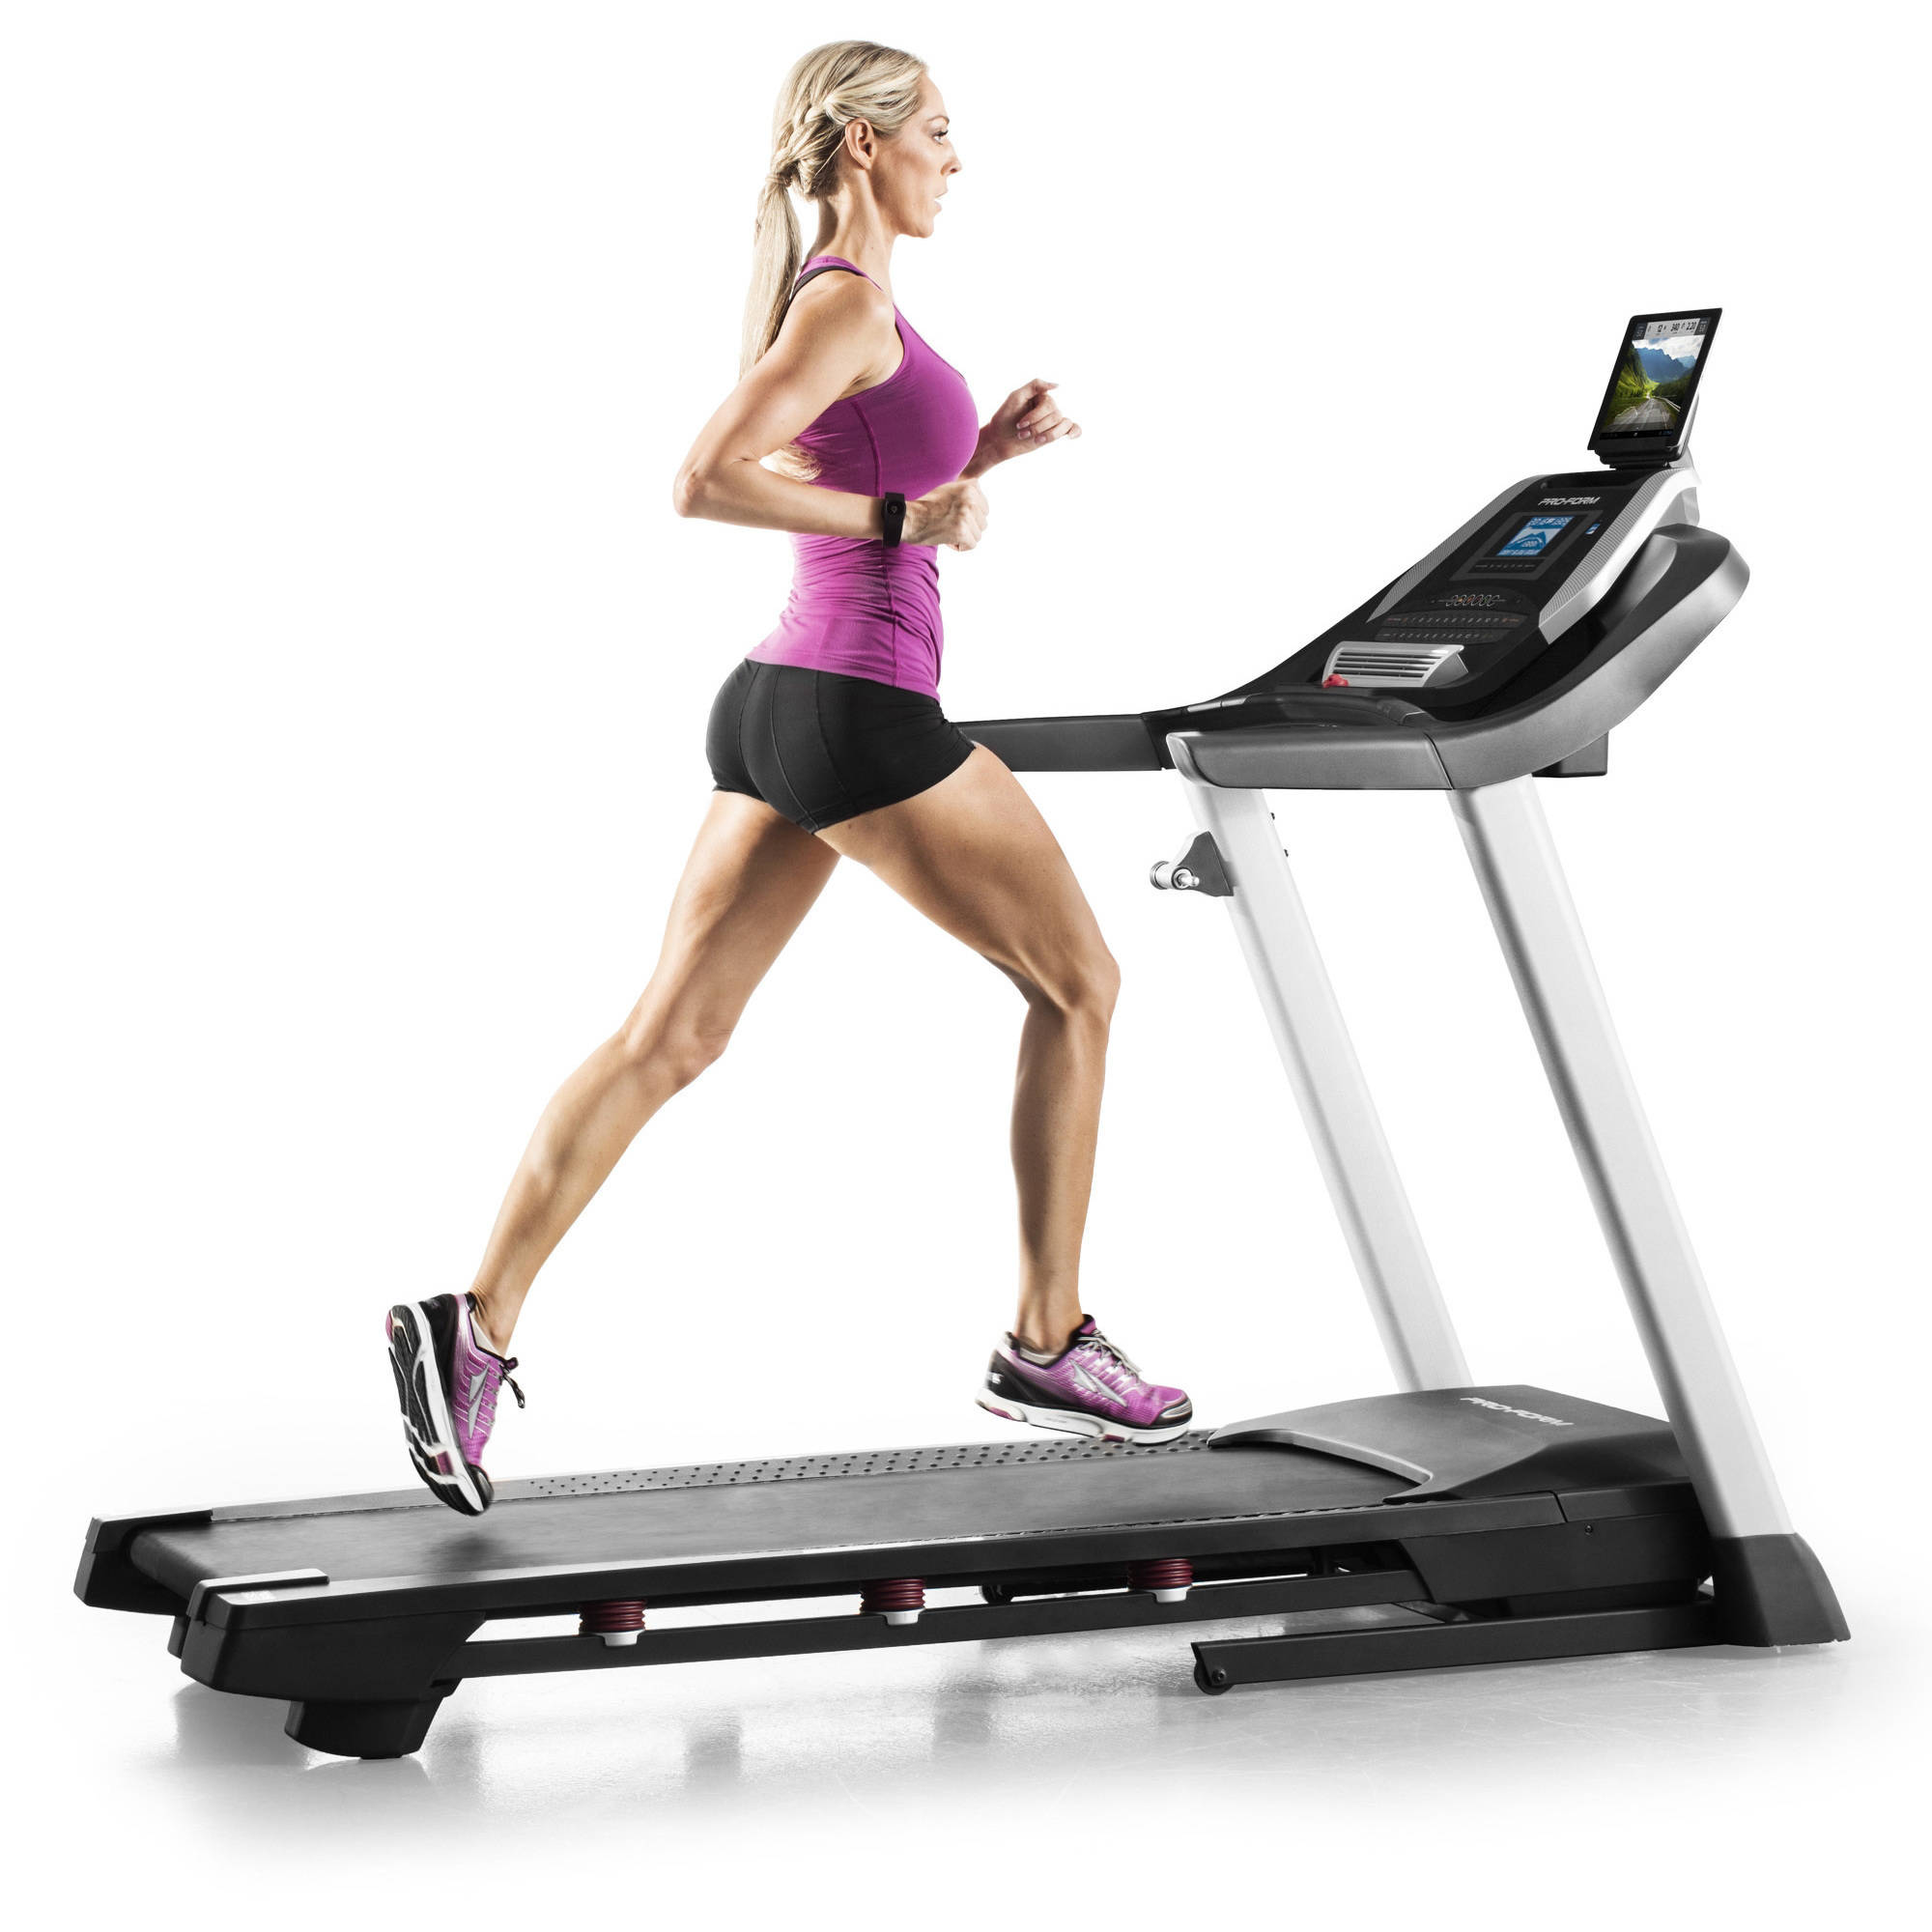 ProForm 705 CST Treadmill by Icon Health & Fitness Inc.